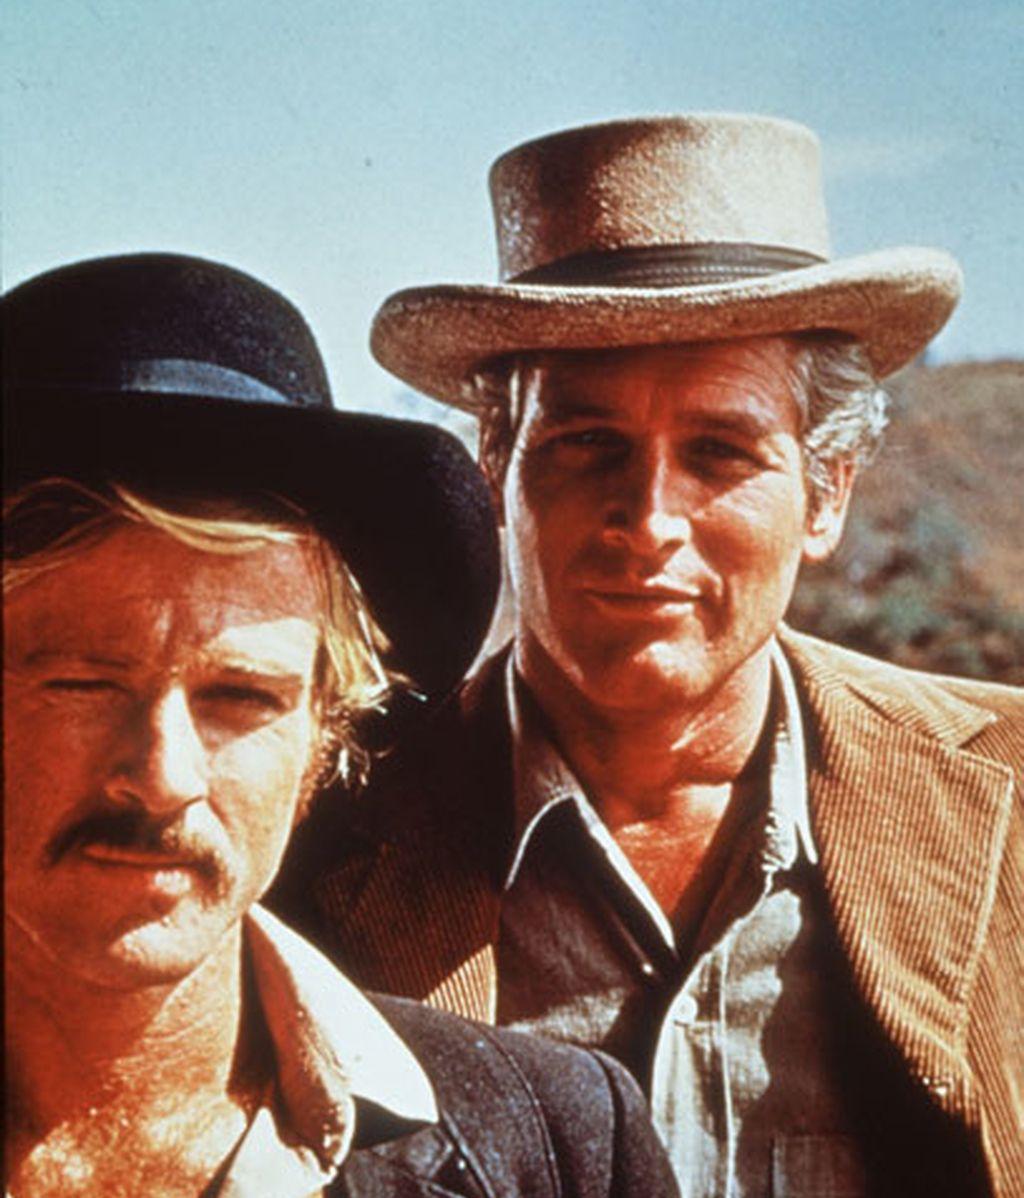 'Dos hombres y un destino', con Paul Newman